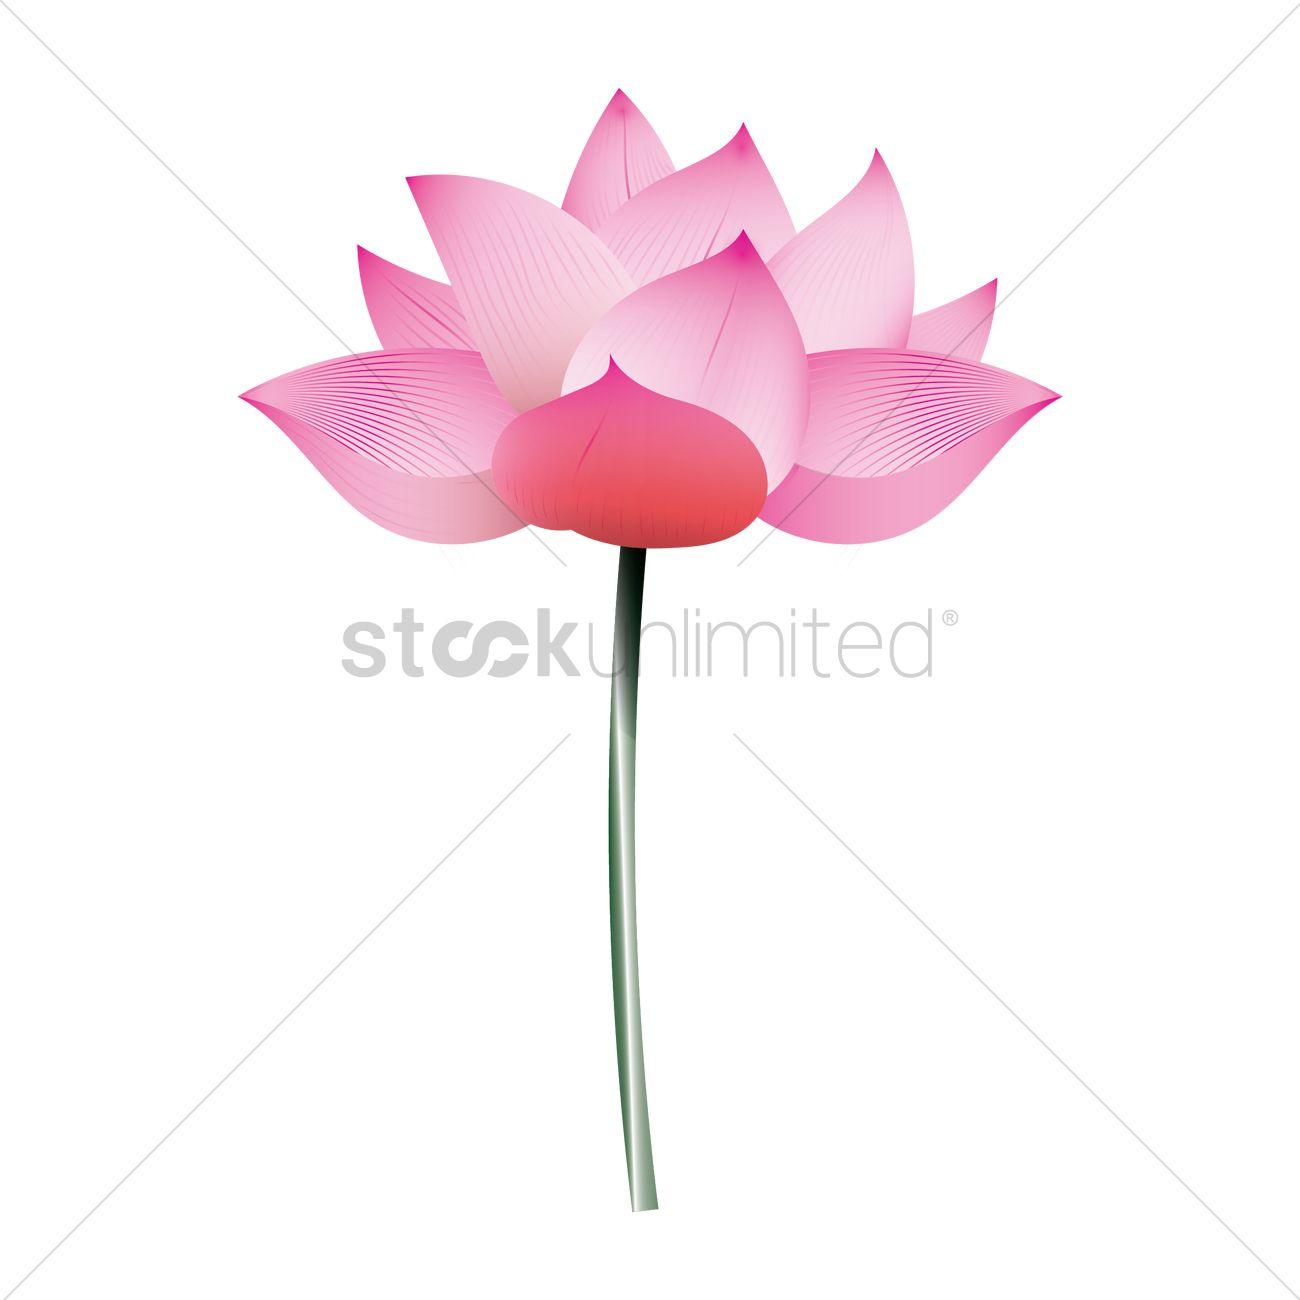 Lotus flower vector image 1937087 stockunlimited lotus flower vector graphic izmirmasajfo